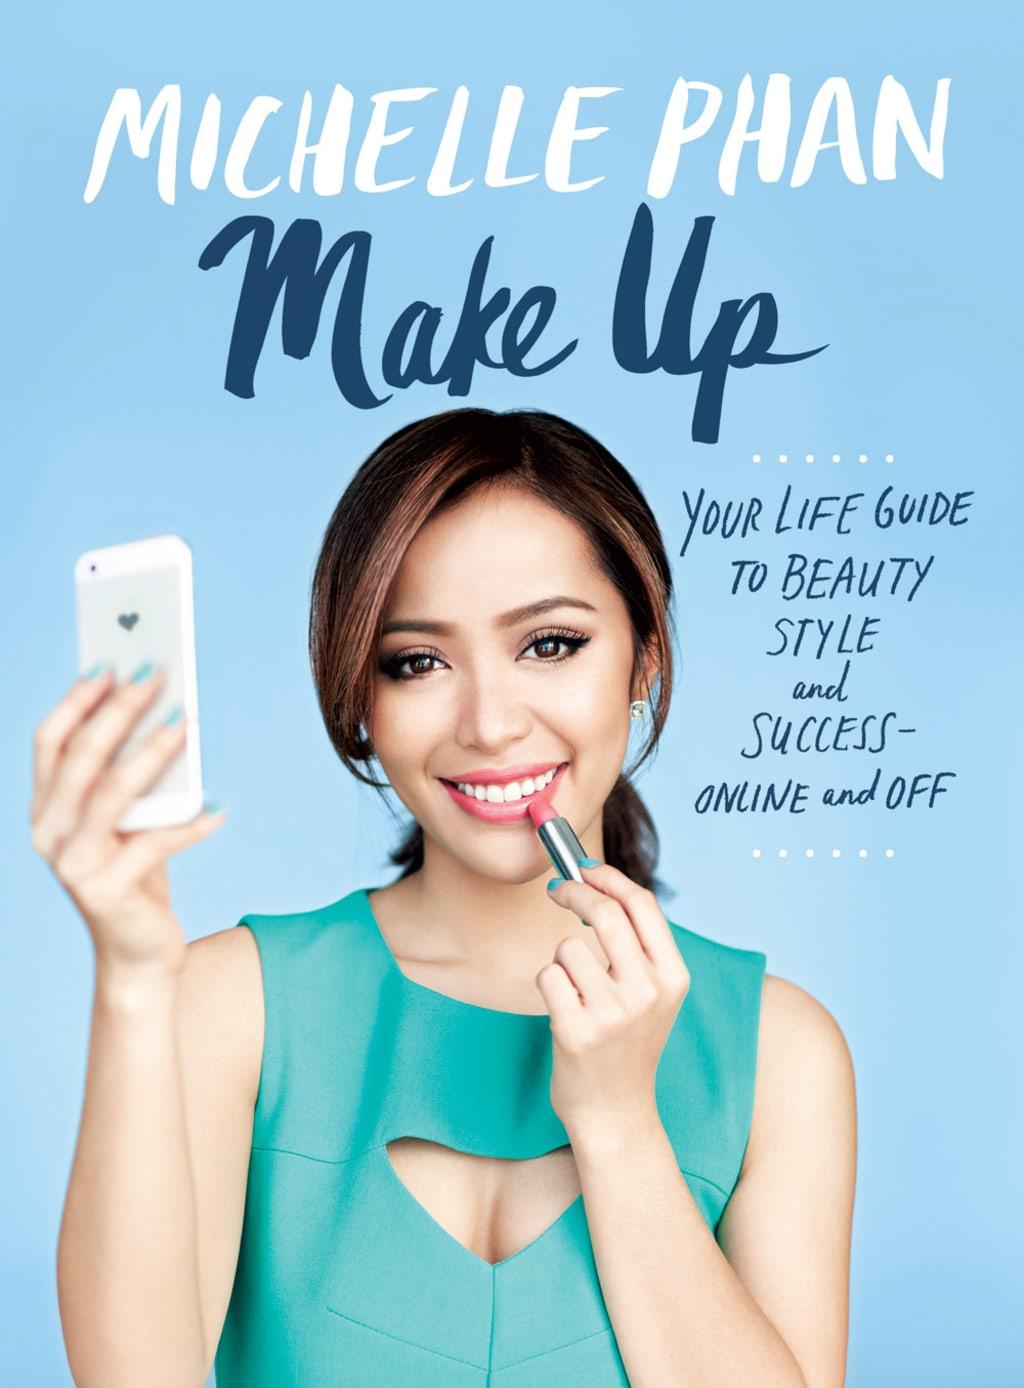 Michelle Phan: 'Make Up'